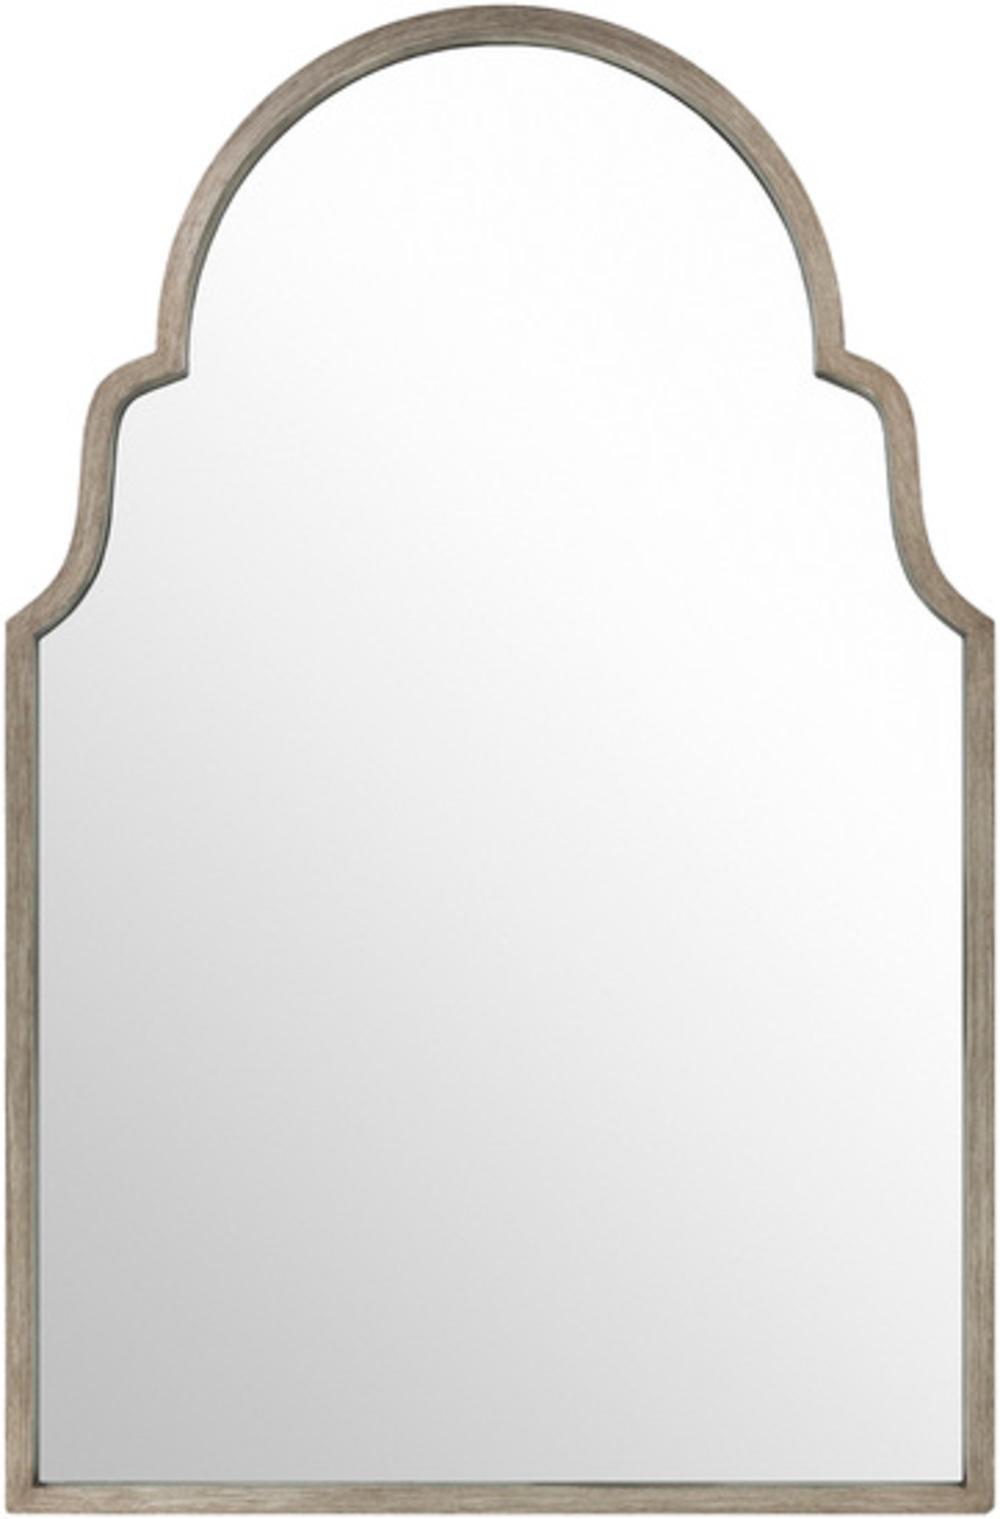 Surya - Vassar Mirror